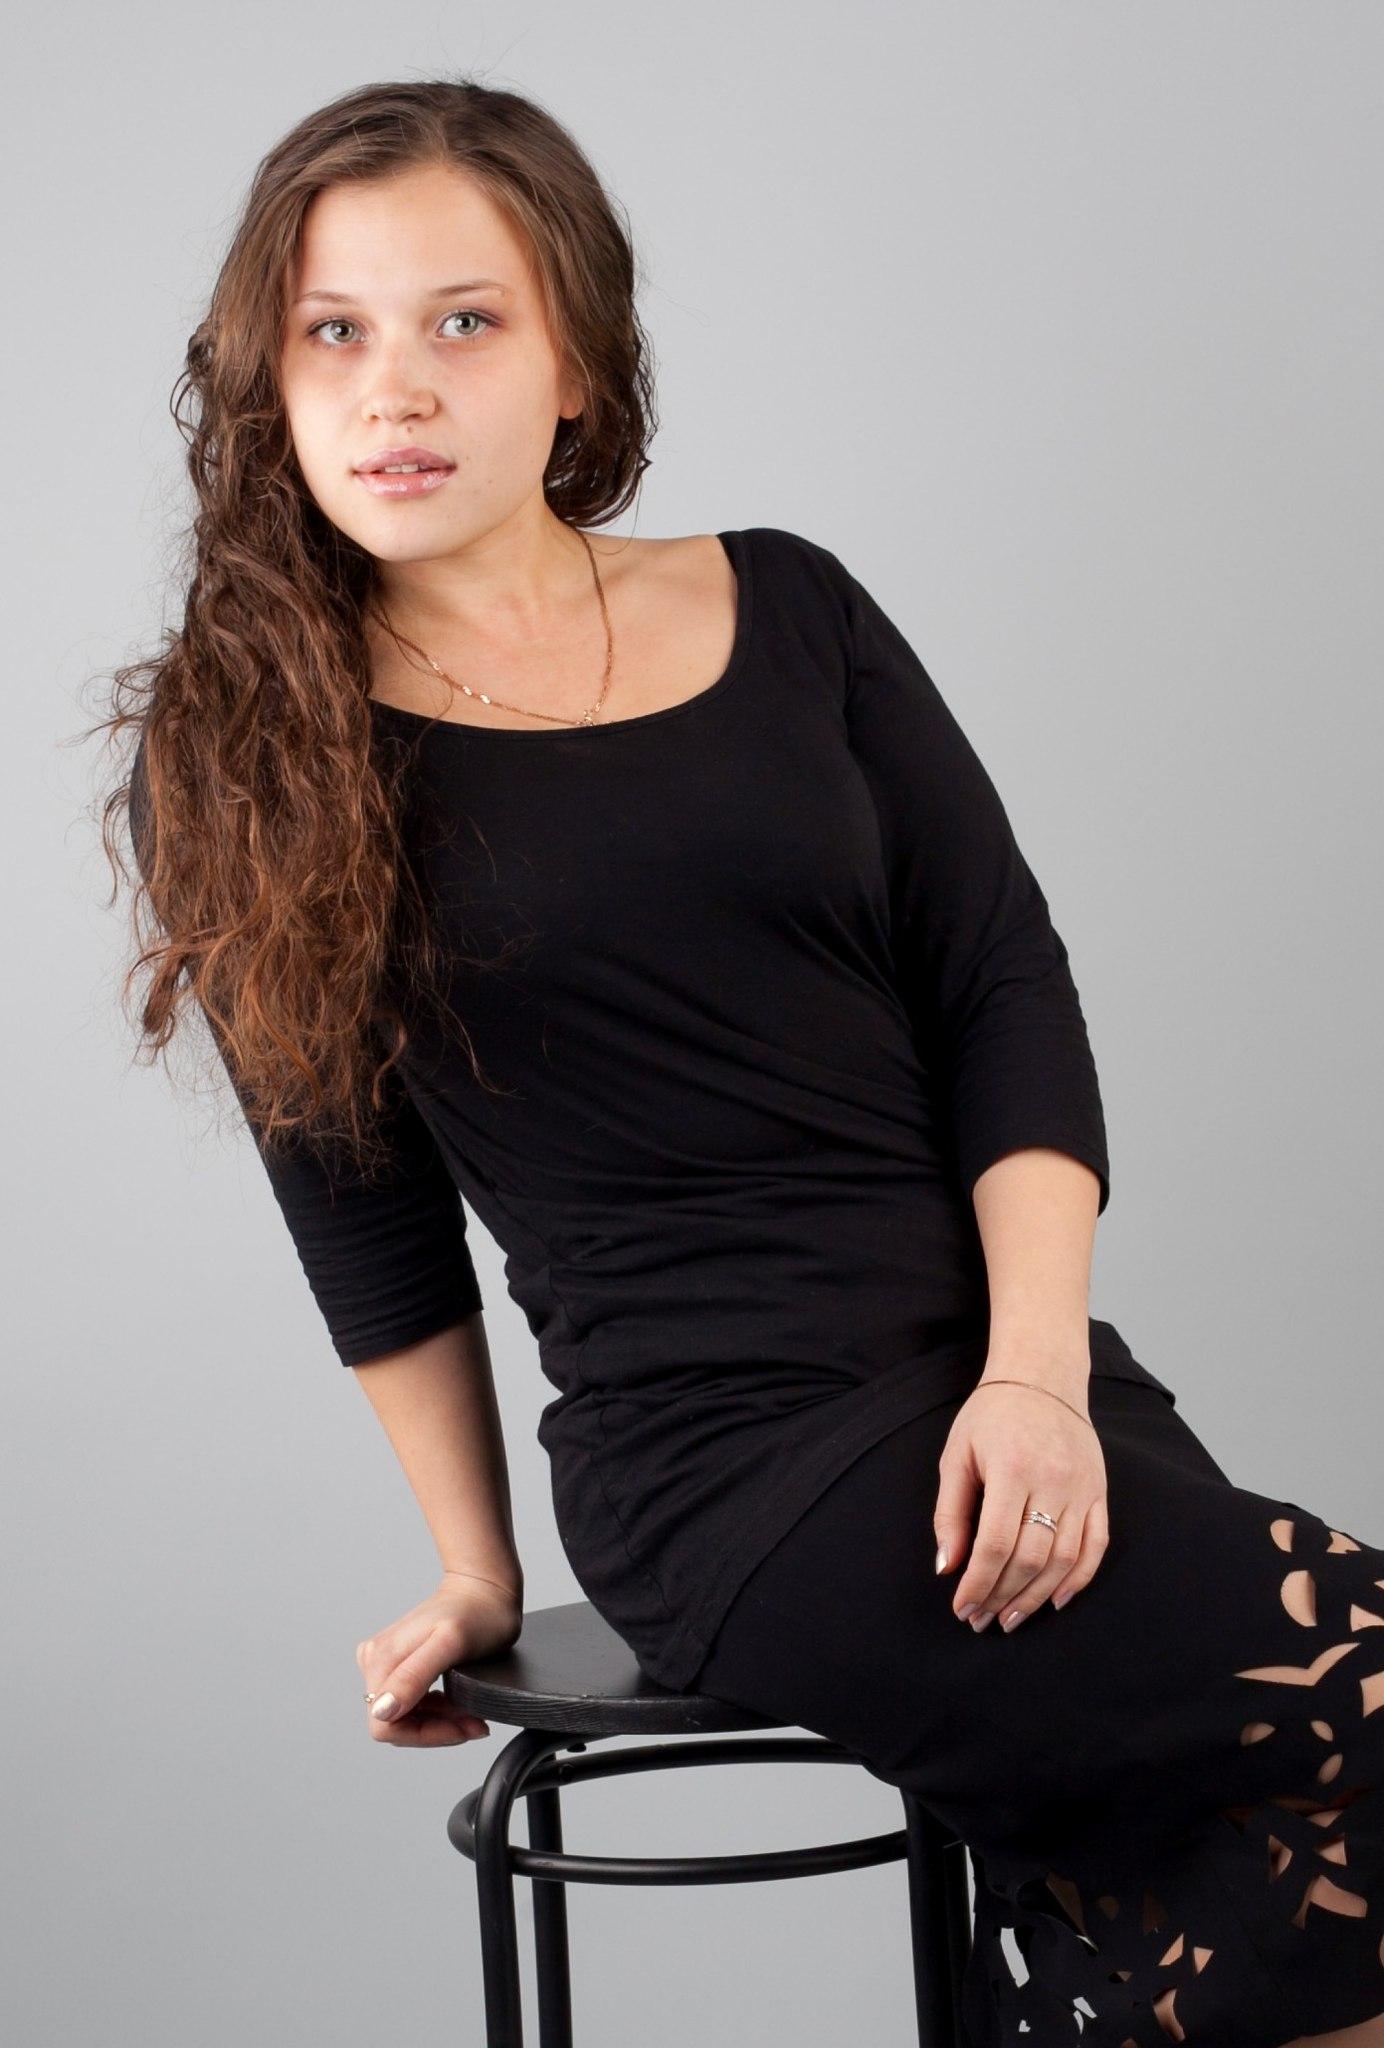 Ганцевич Анастасия Дмитриевна